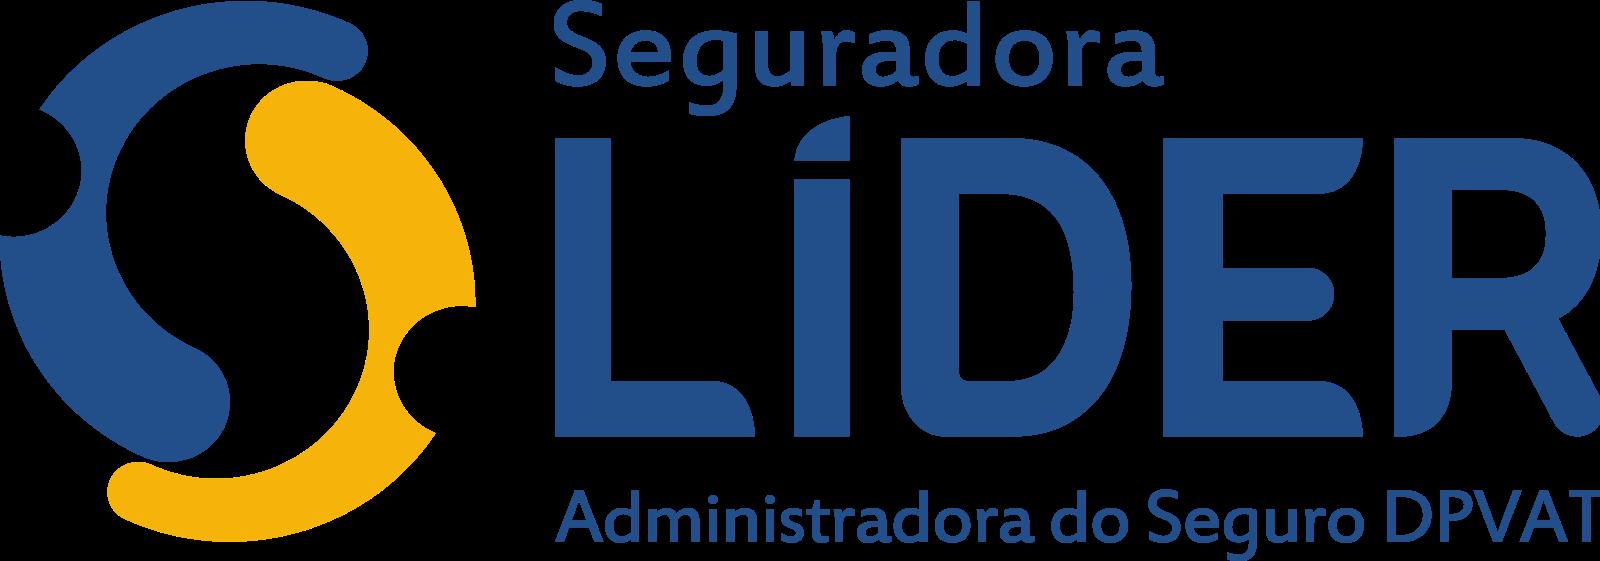 seguradora lider dpvat logo 2 - Seguradora Líder Logo (DPVAT)